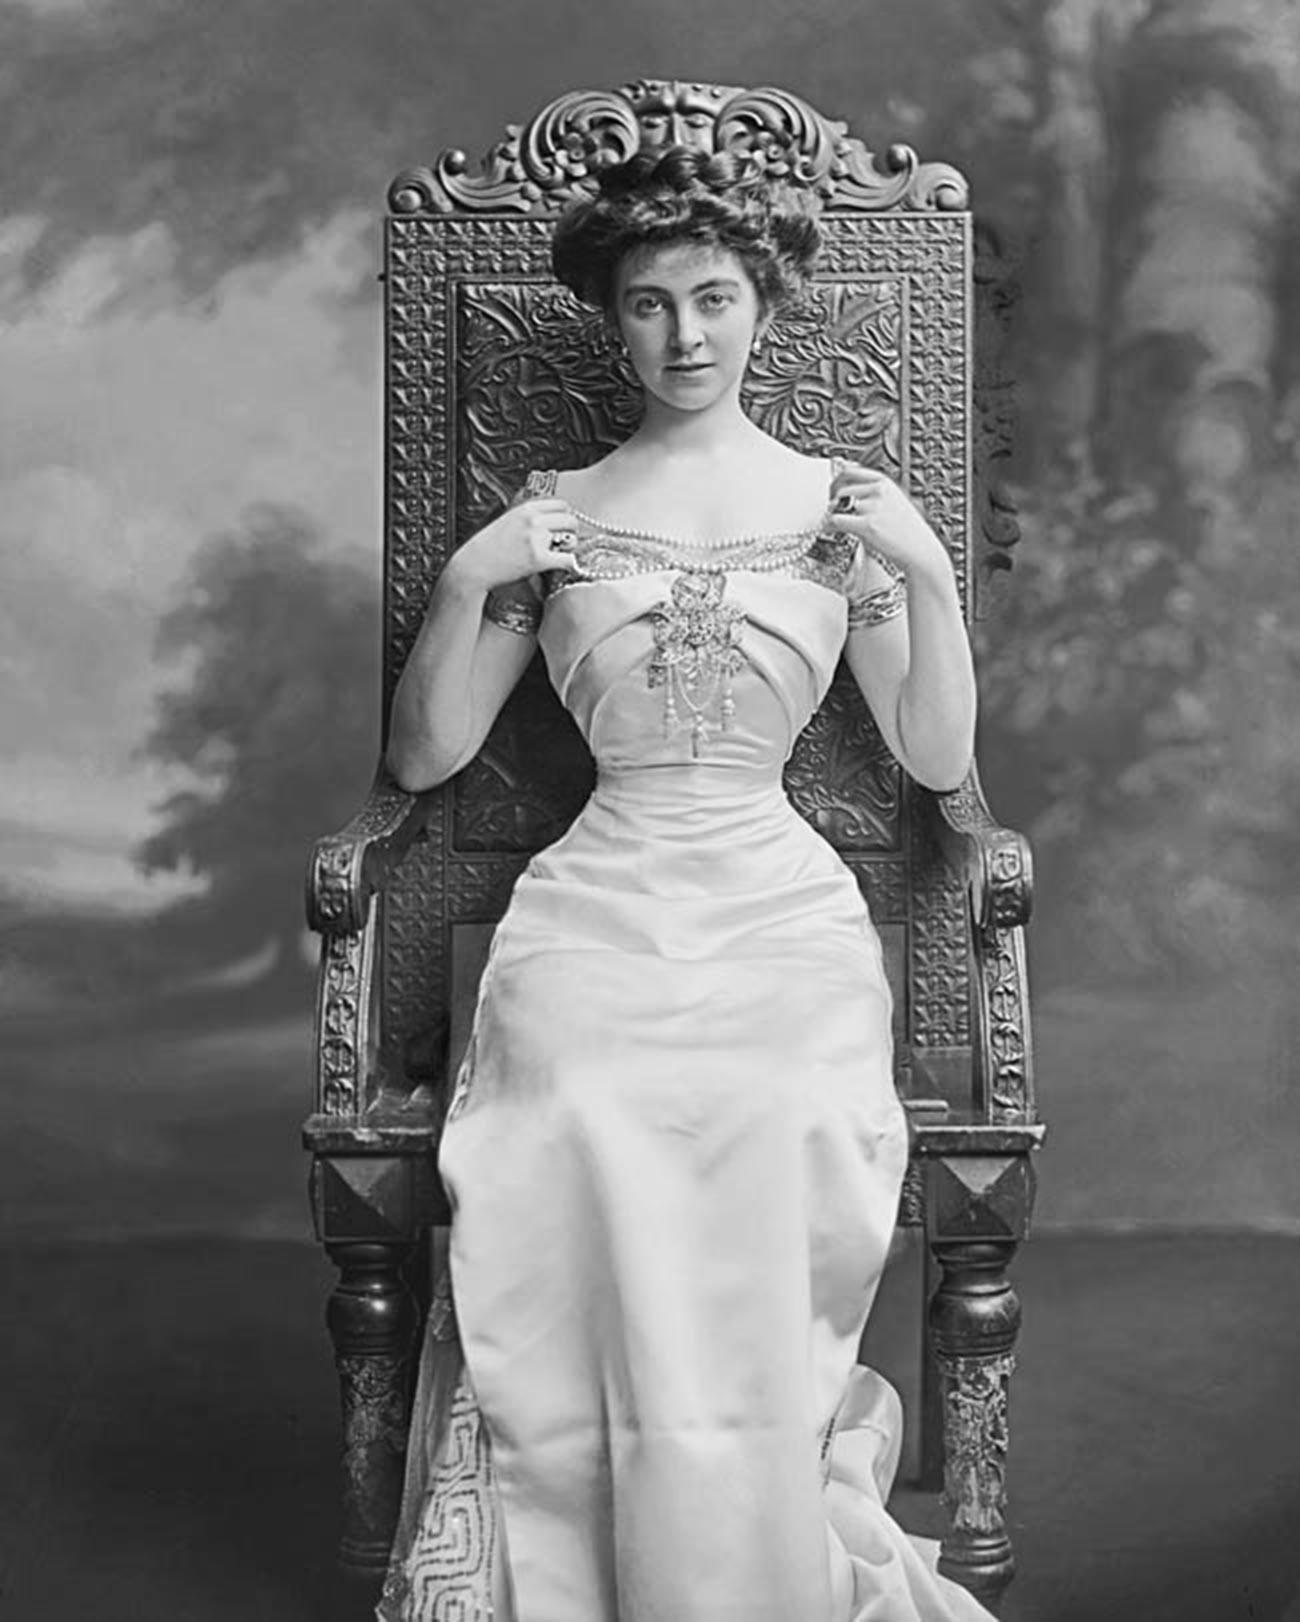 Constance Edwina Lewis